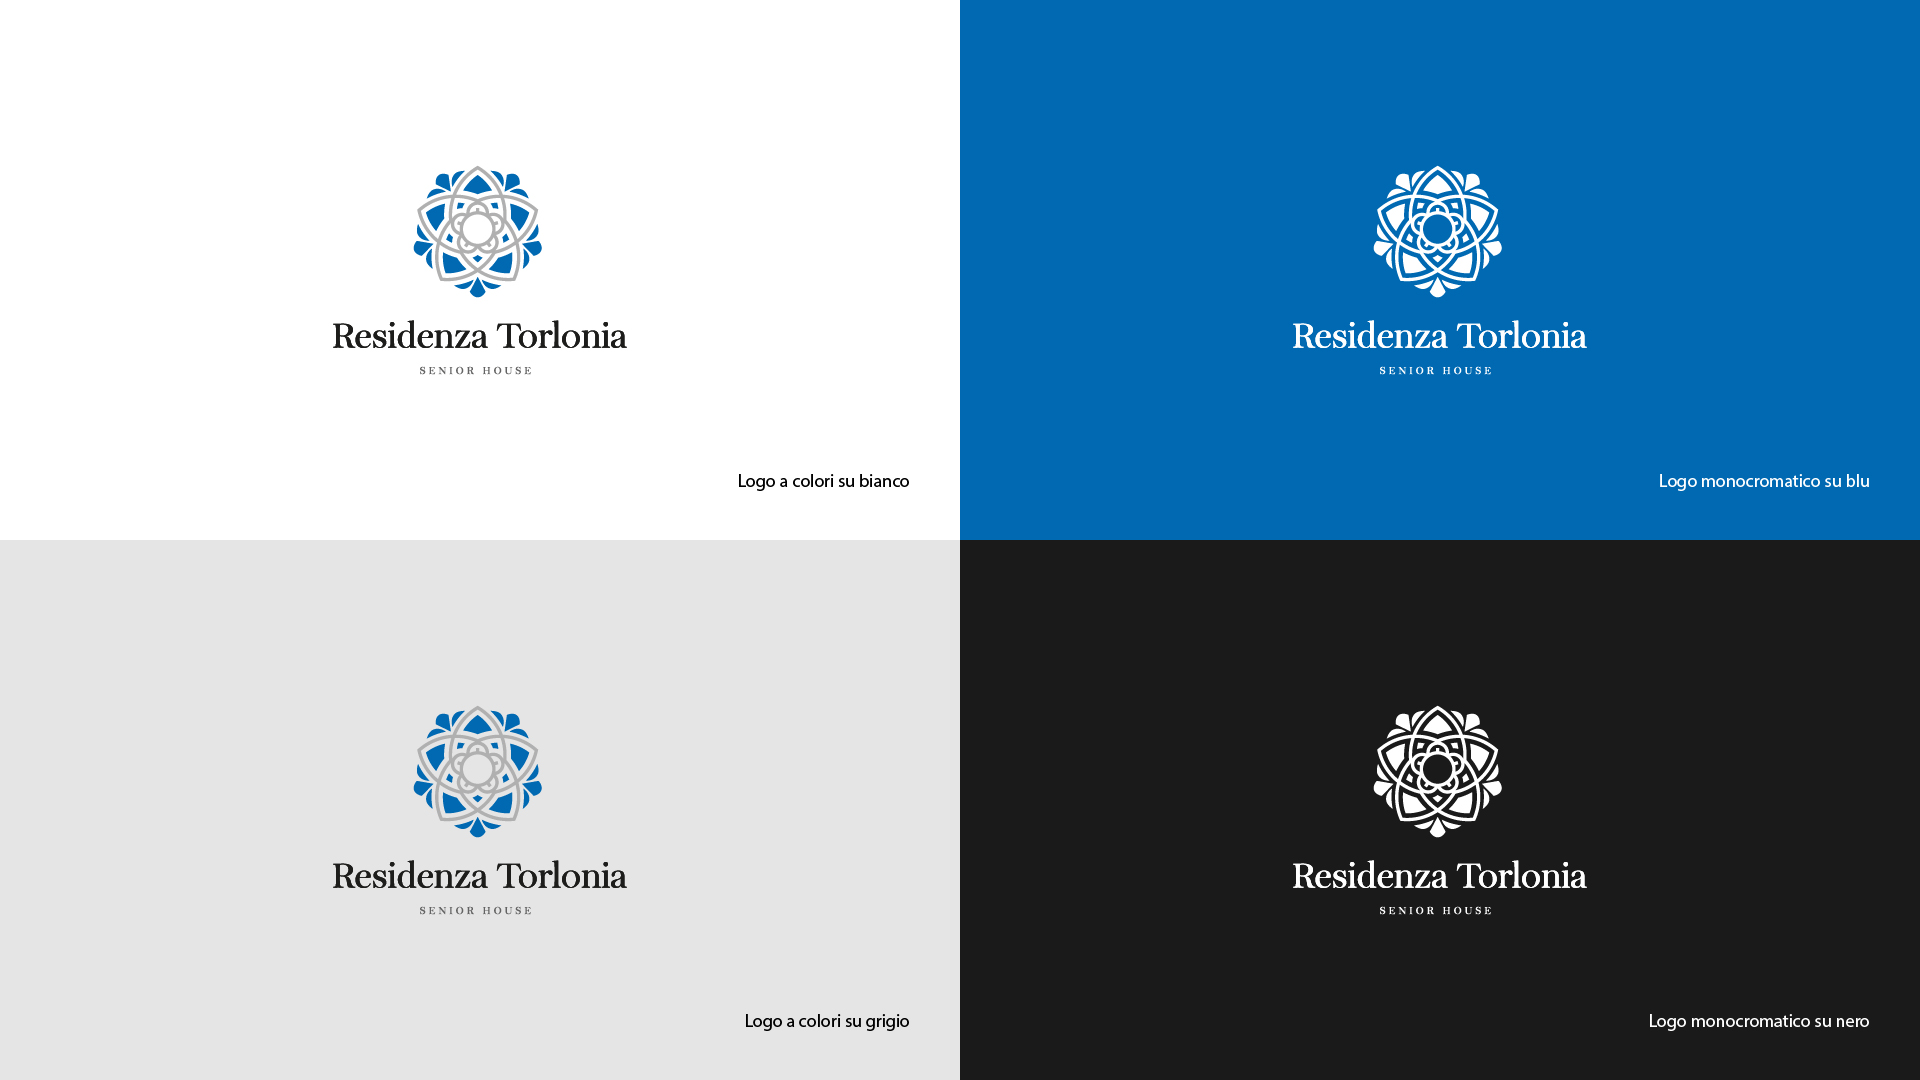 residenza-torlonia-logo-colori